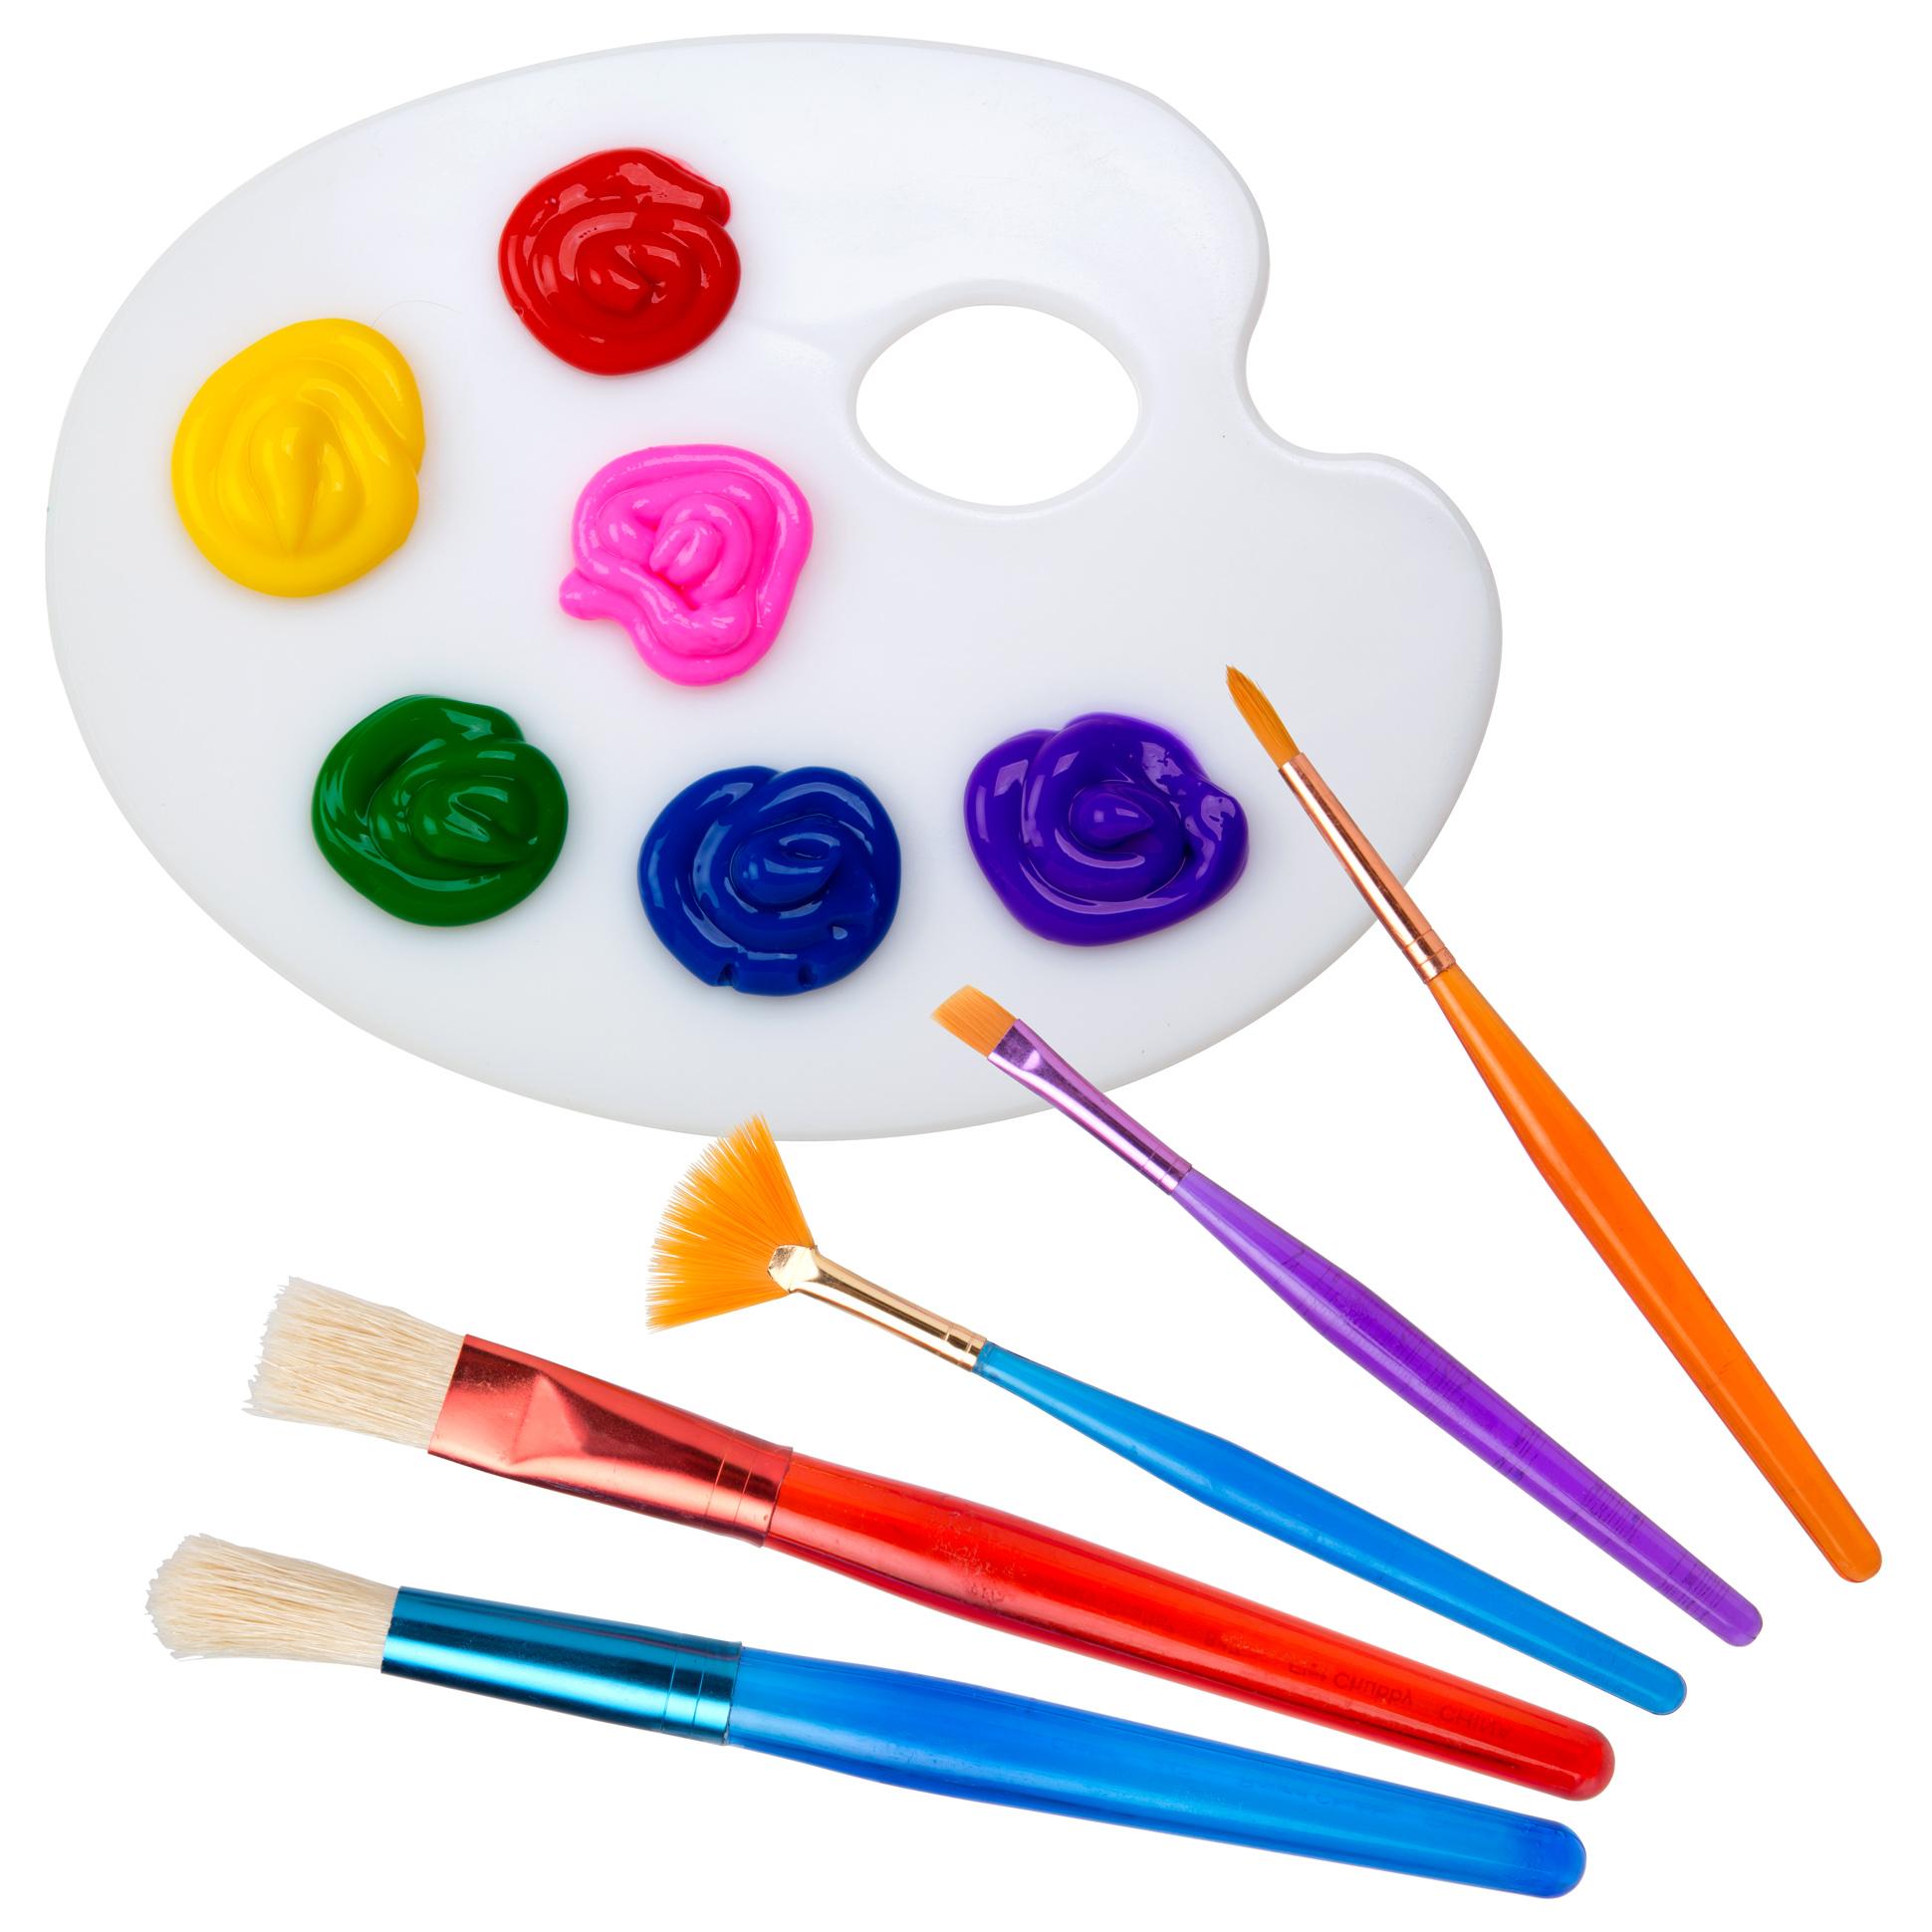 ALEX Toys Artist Studio Paint Brush and Palette Set - AlexBrands.com